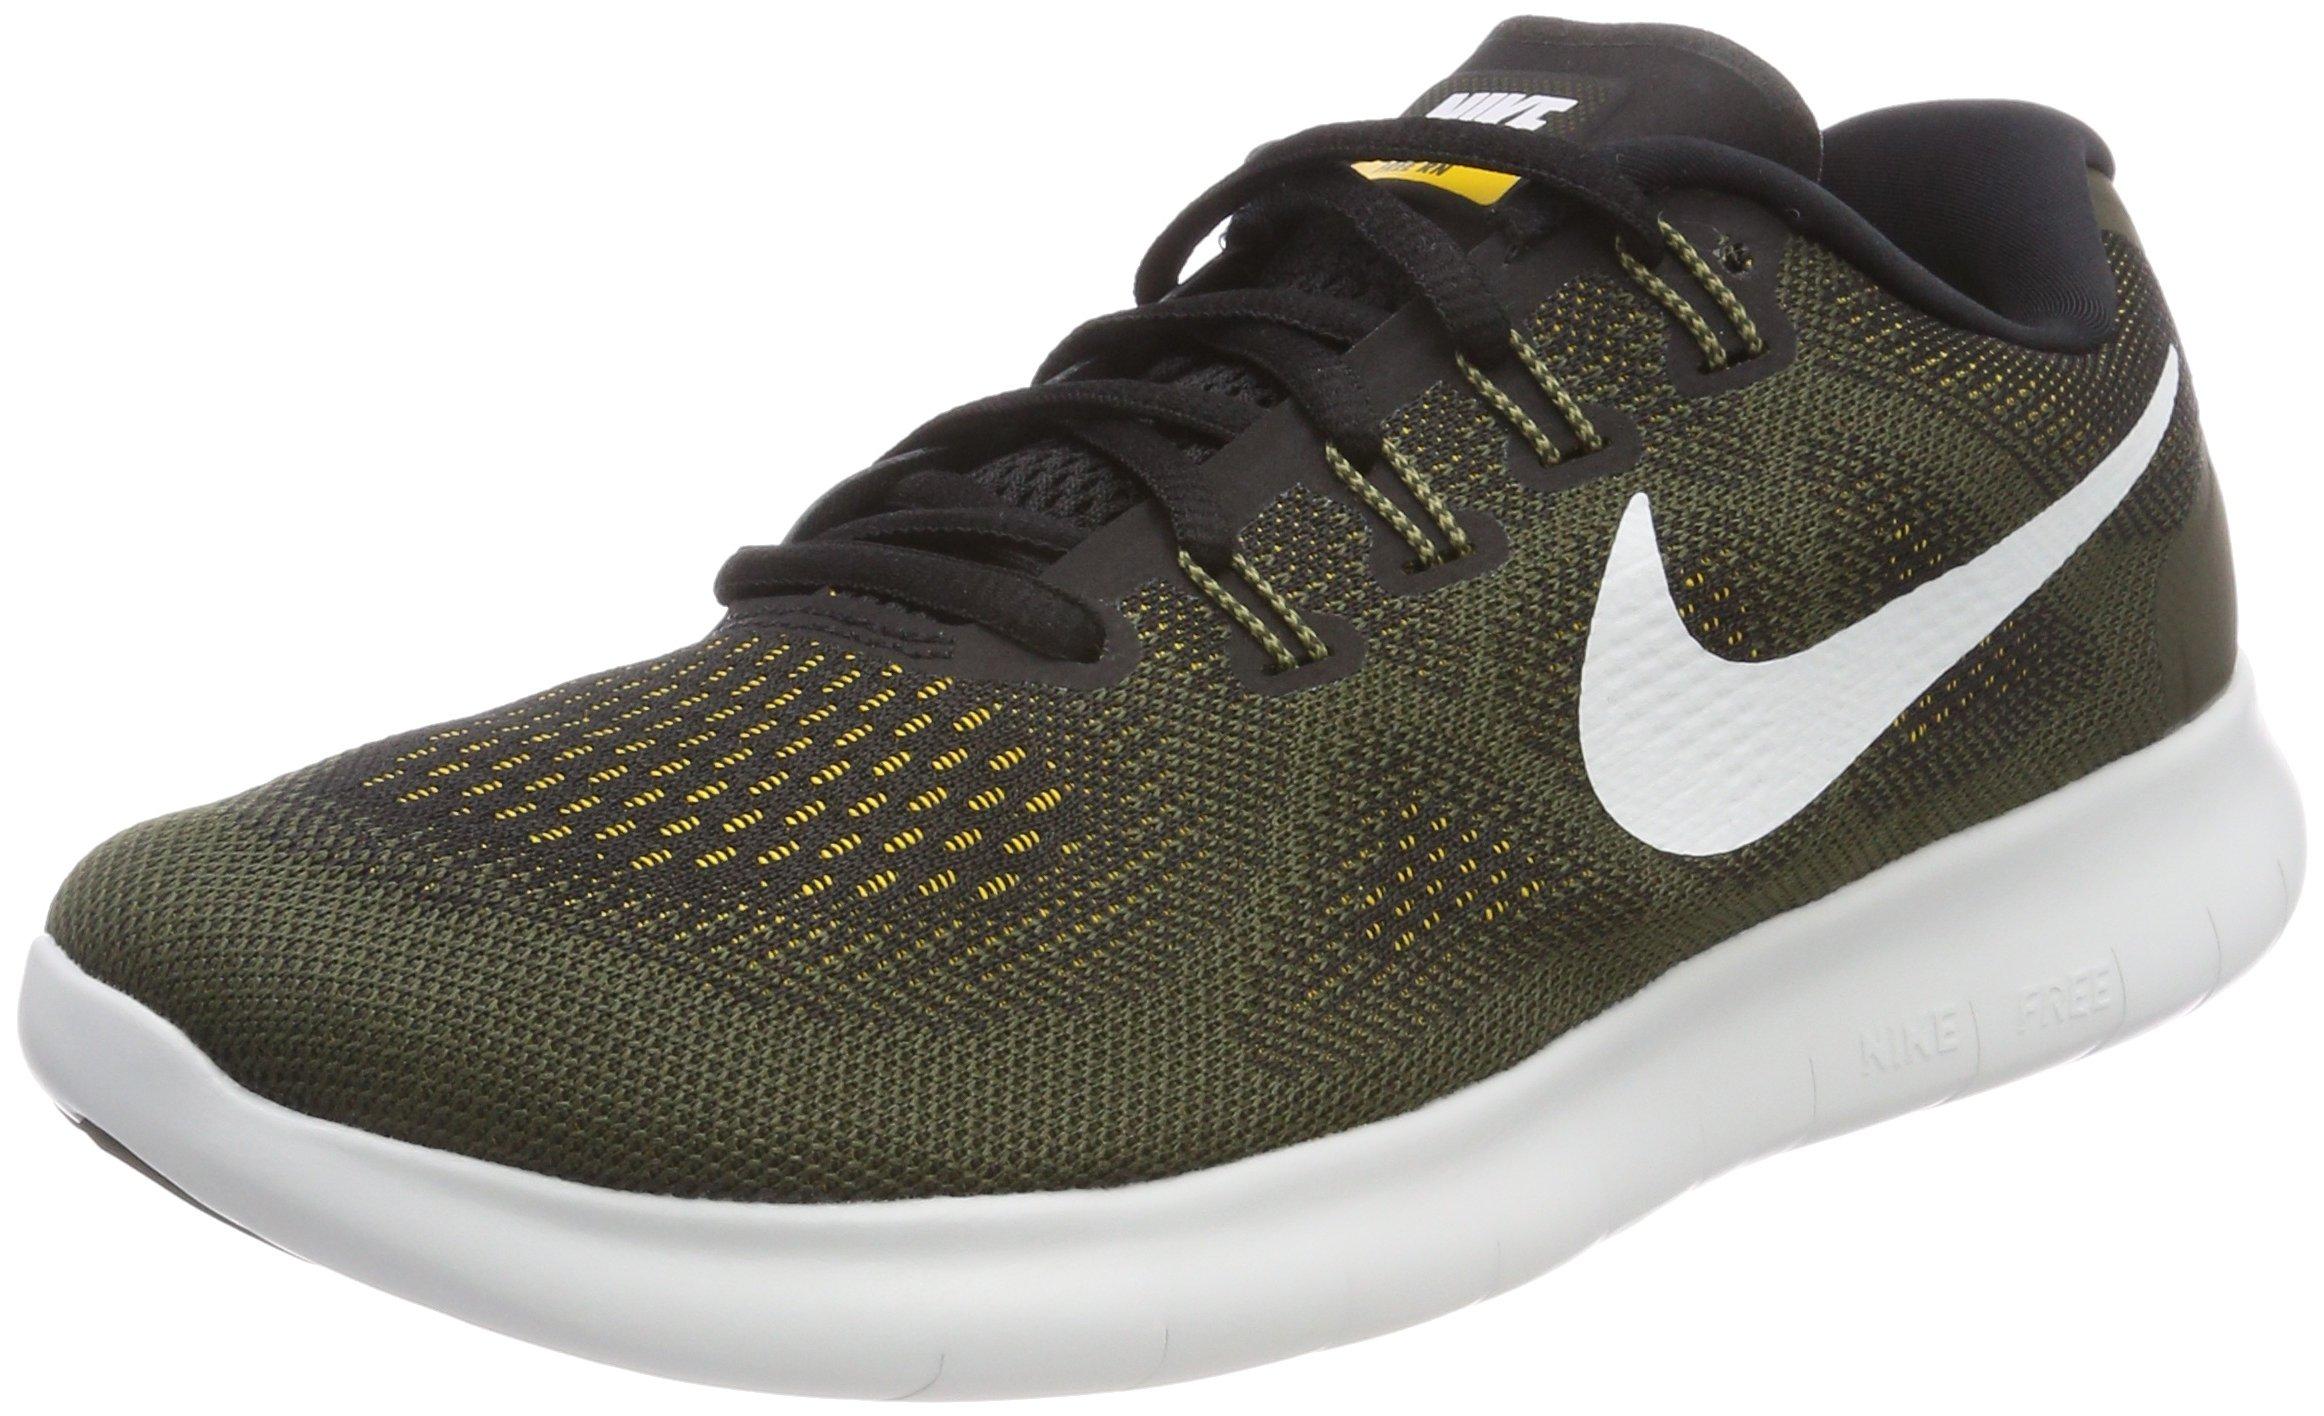 Nike Womens Free Run Distance Low Top, Black/Off-White/Cargo Khaki, Size 11.0 by Nike